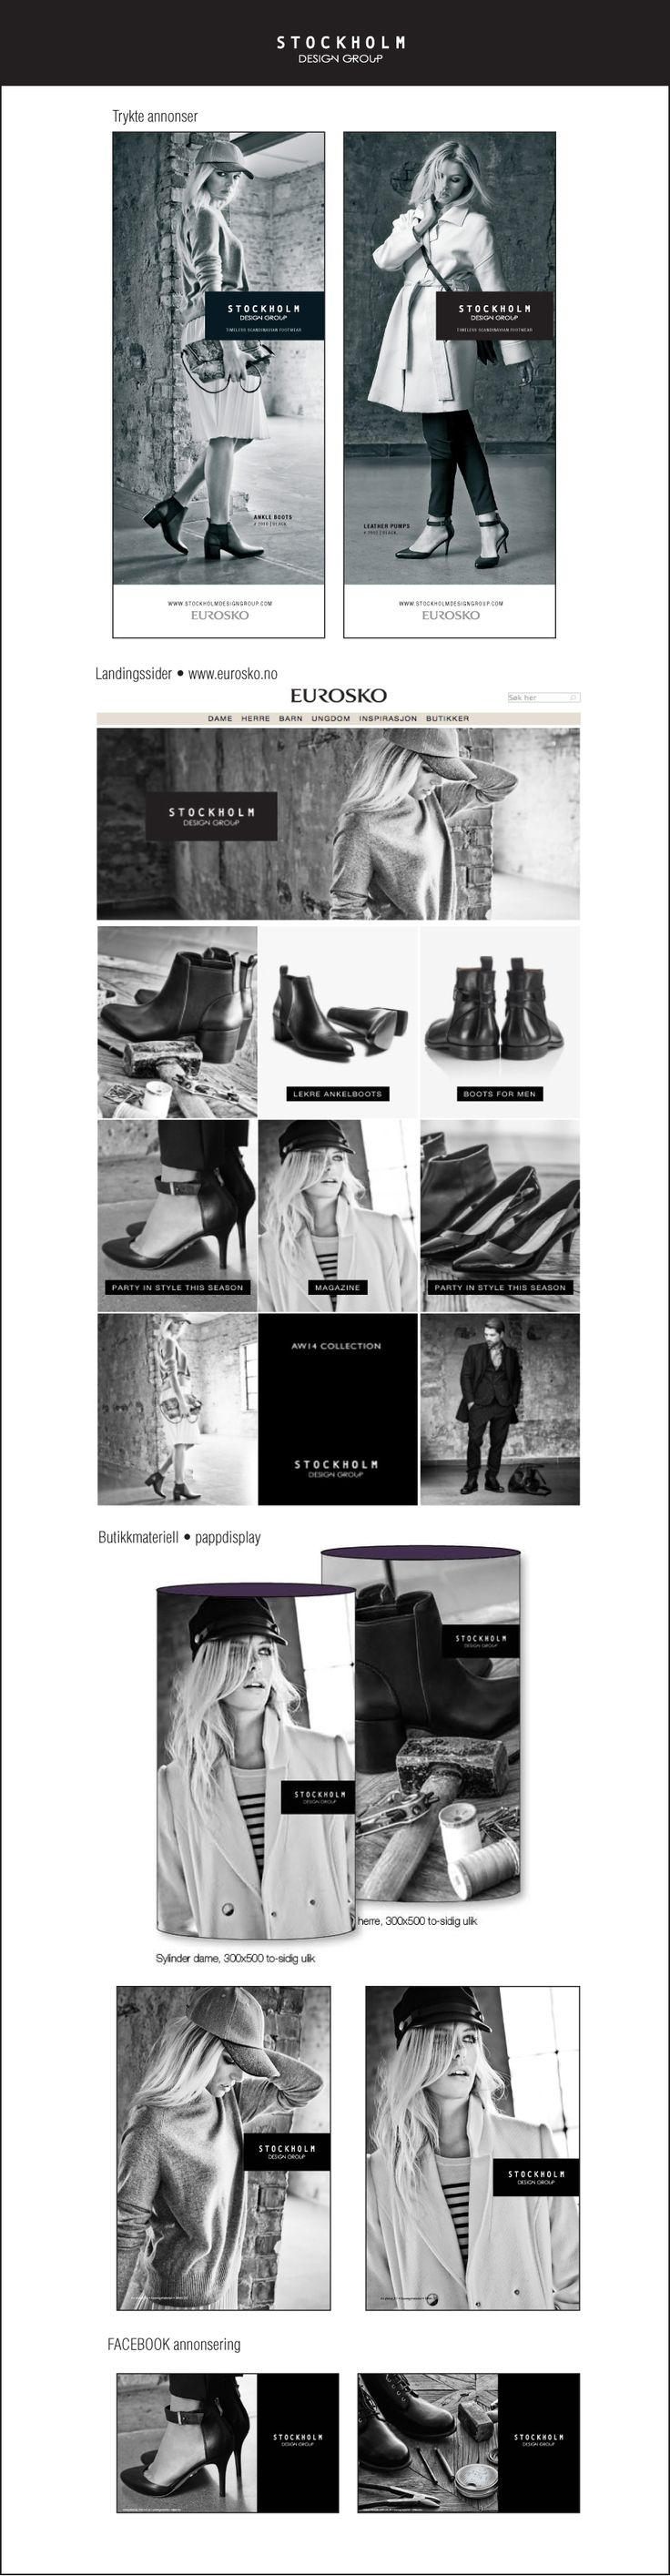 Stockholm DG kampanje høst 2014 Fotoshoot • markedsføring • annonsering • Facebook • Instagram • butikkmateriell